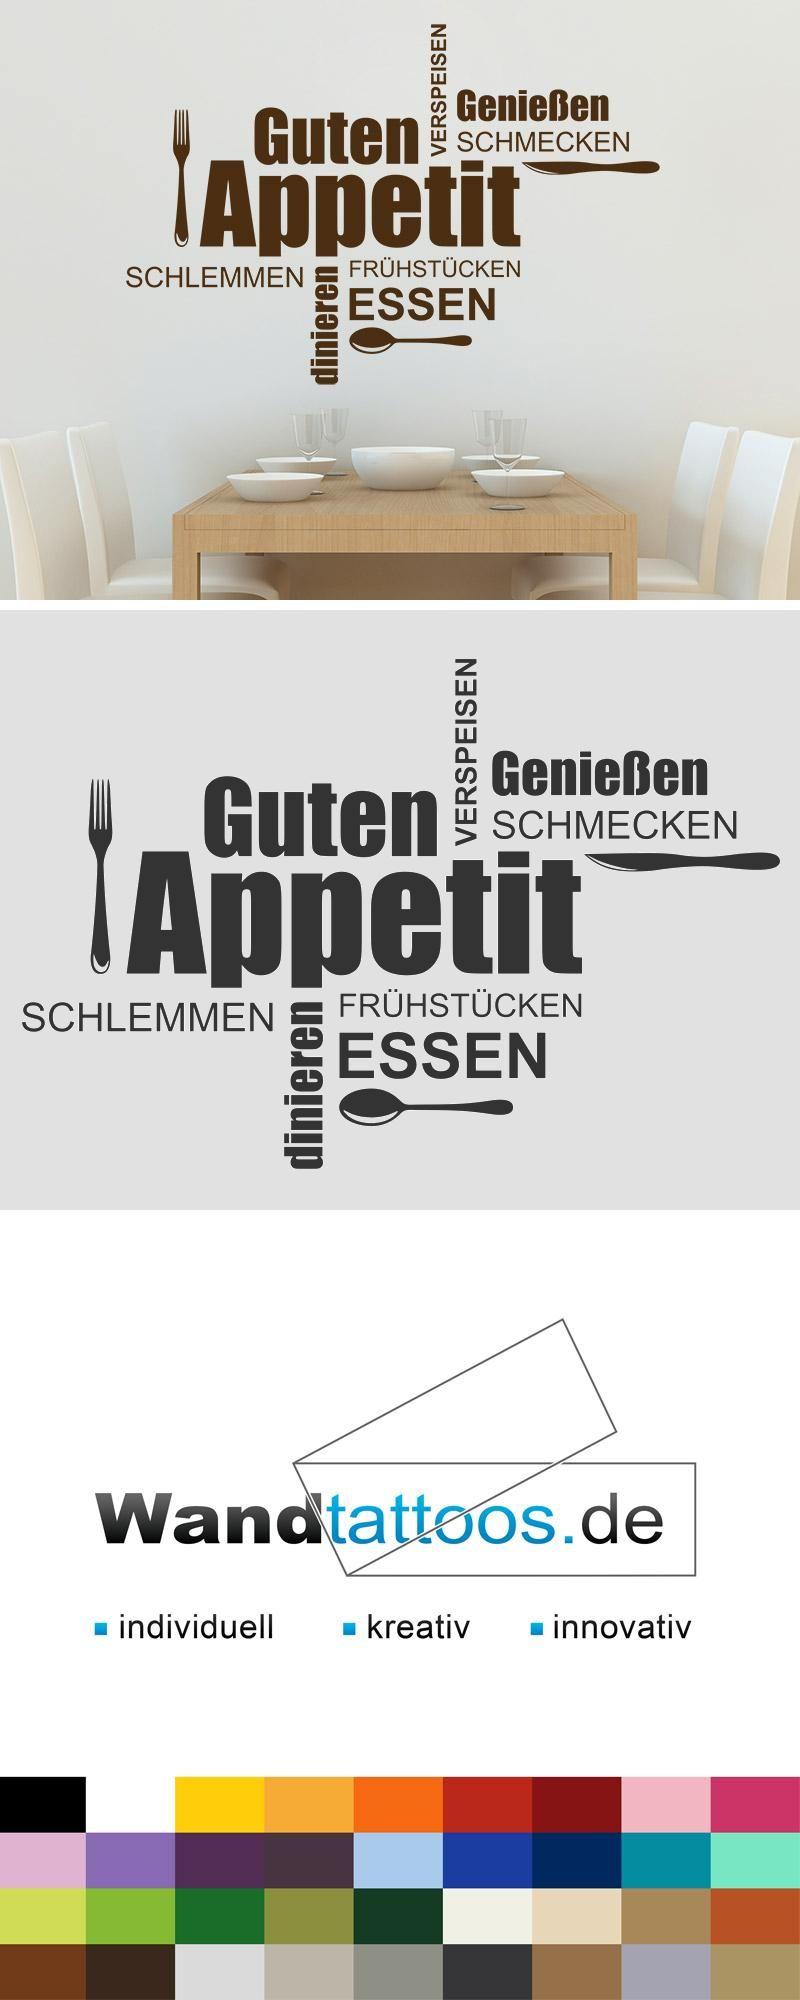 Wandtattoo Wortwolke Guten Appetit Essen Wandtattoos De Wandtattoo Wortwolke Wandtatoo